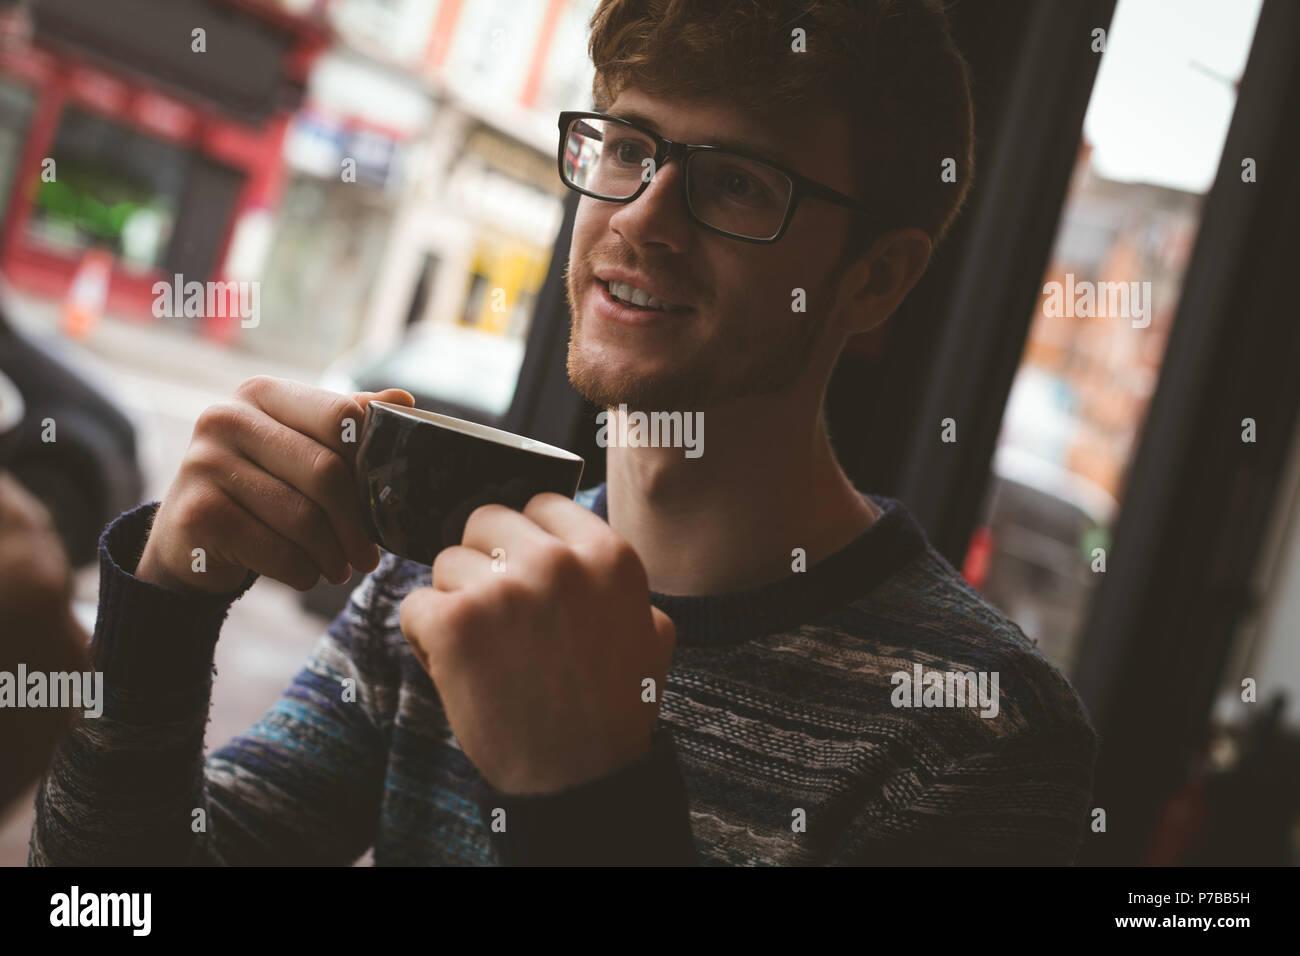 Man having coffee in cafe Stock Photo